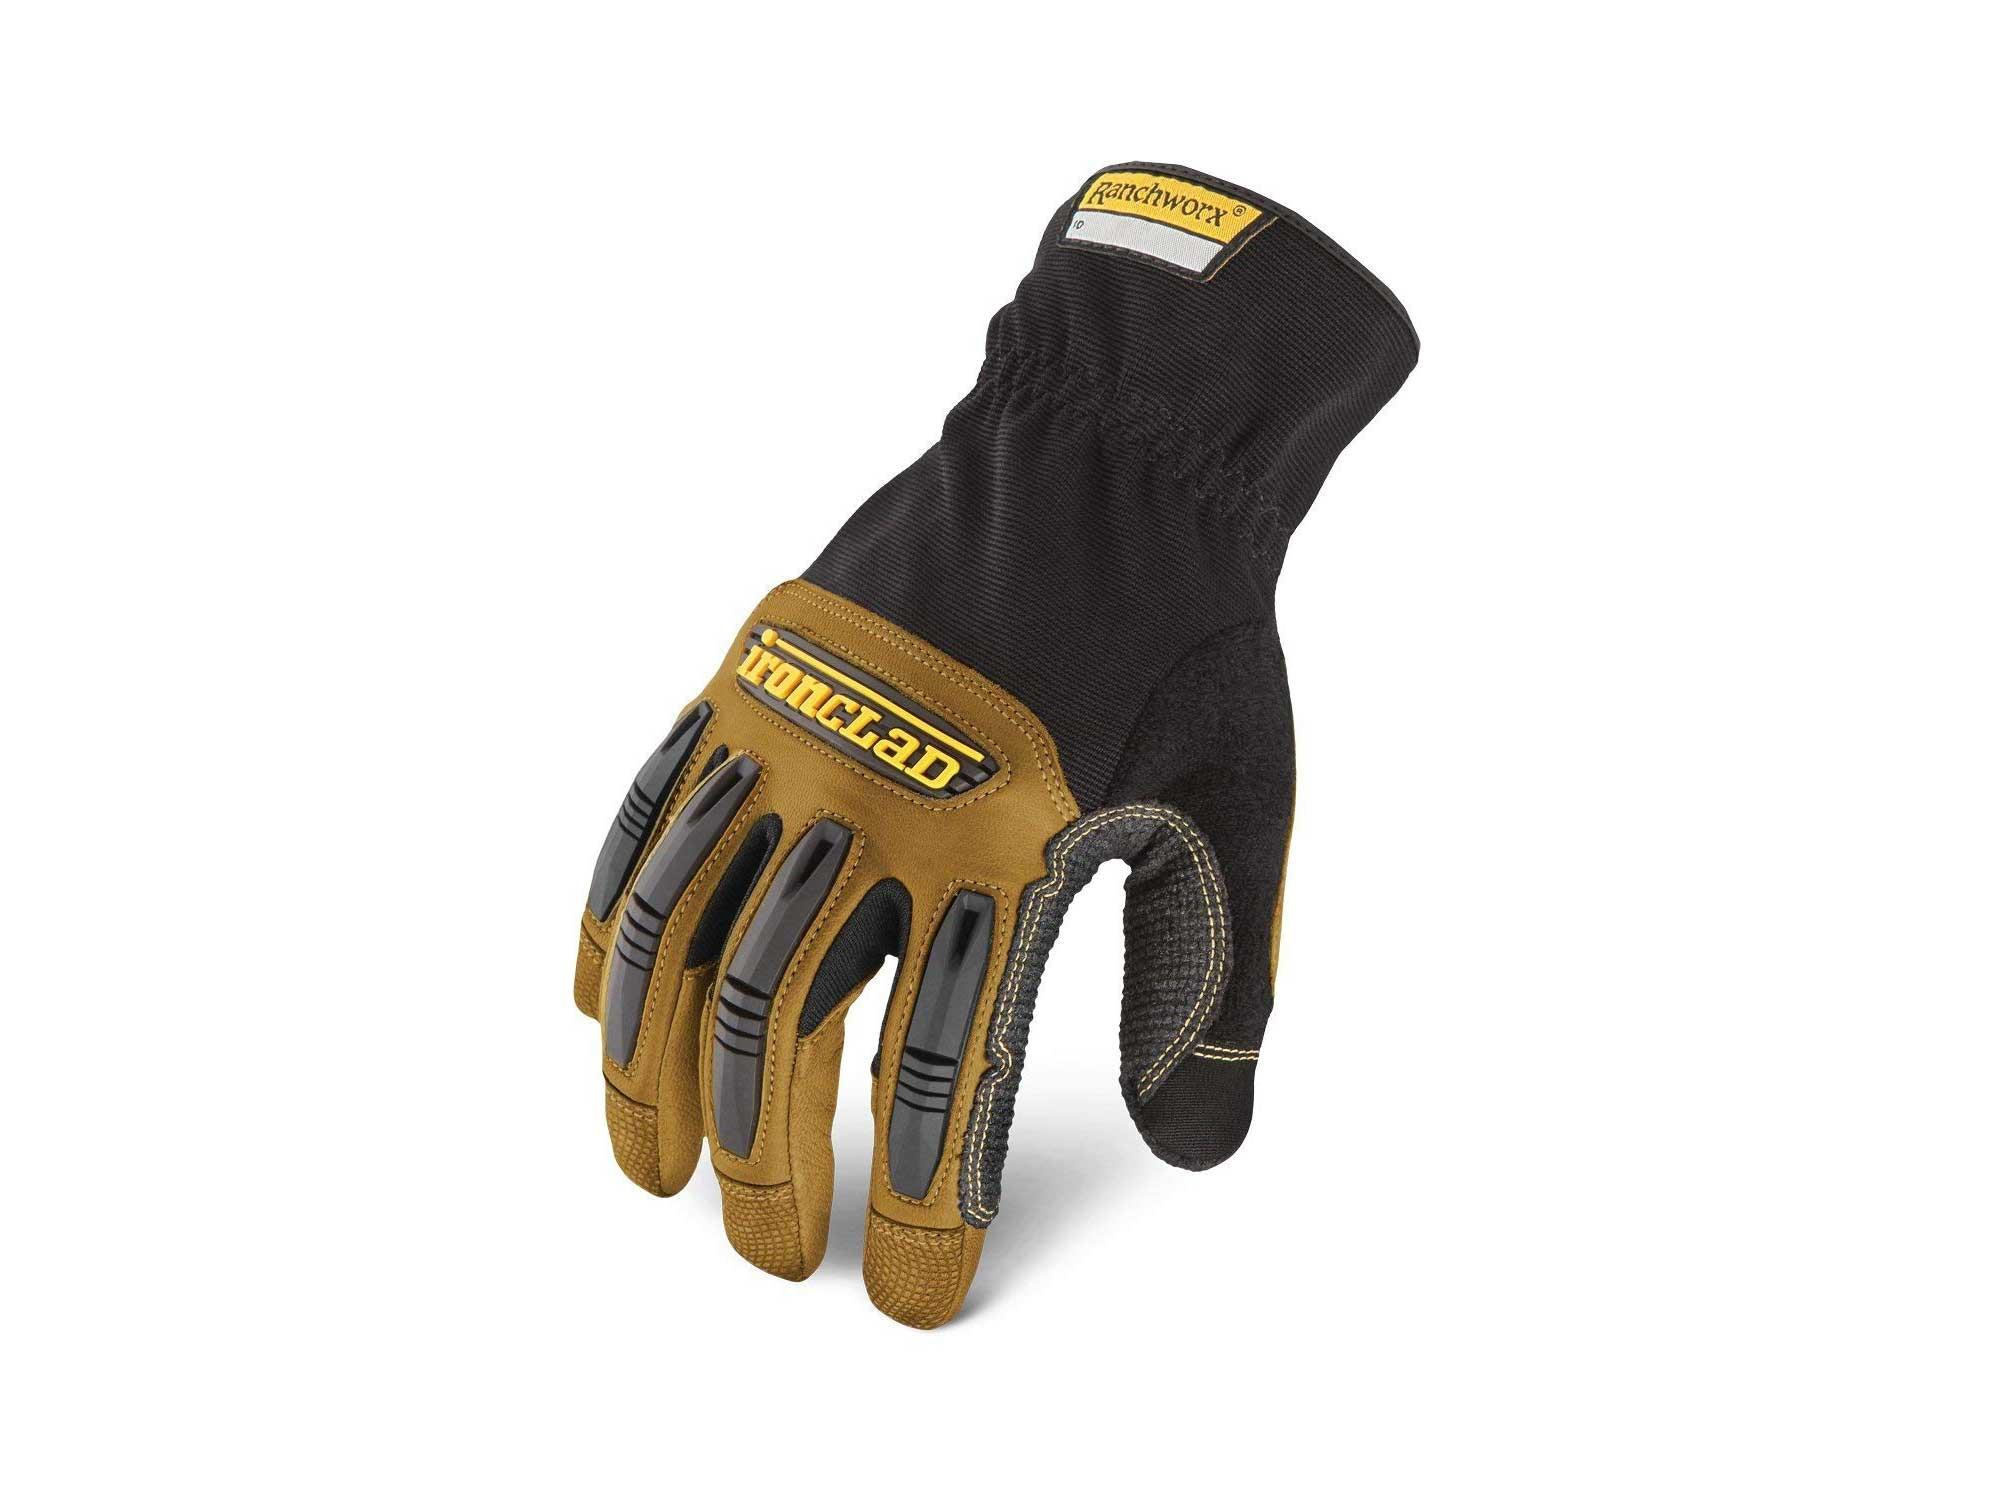 Ironclad Ranchworx Work Gloves RWG2